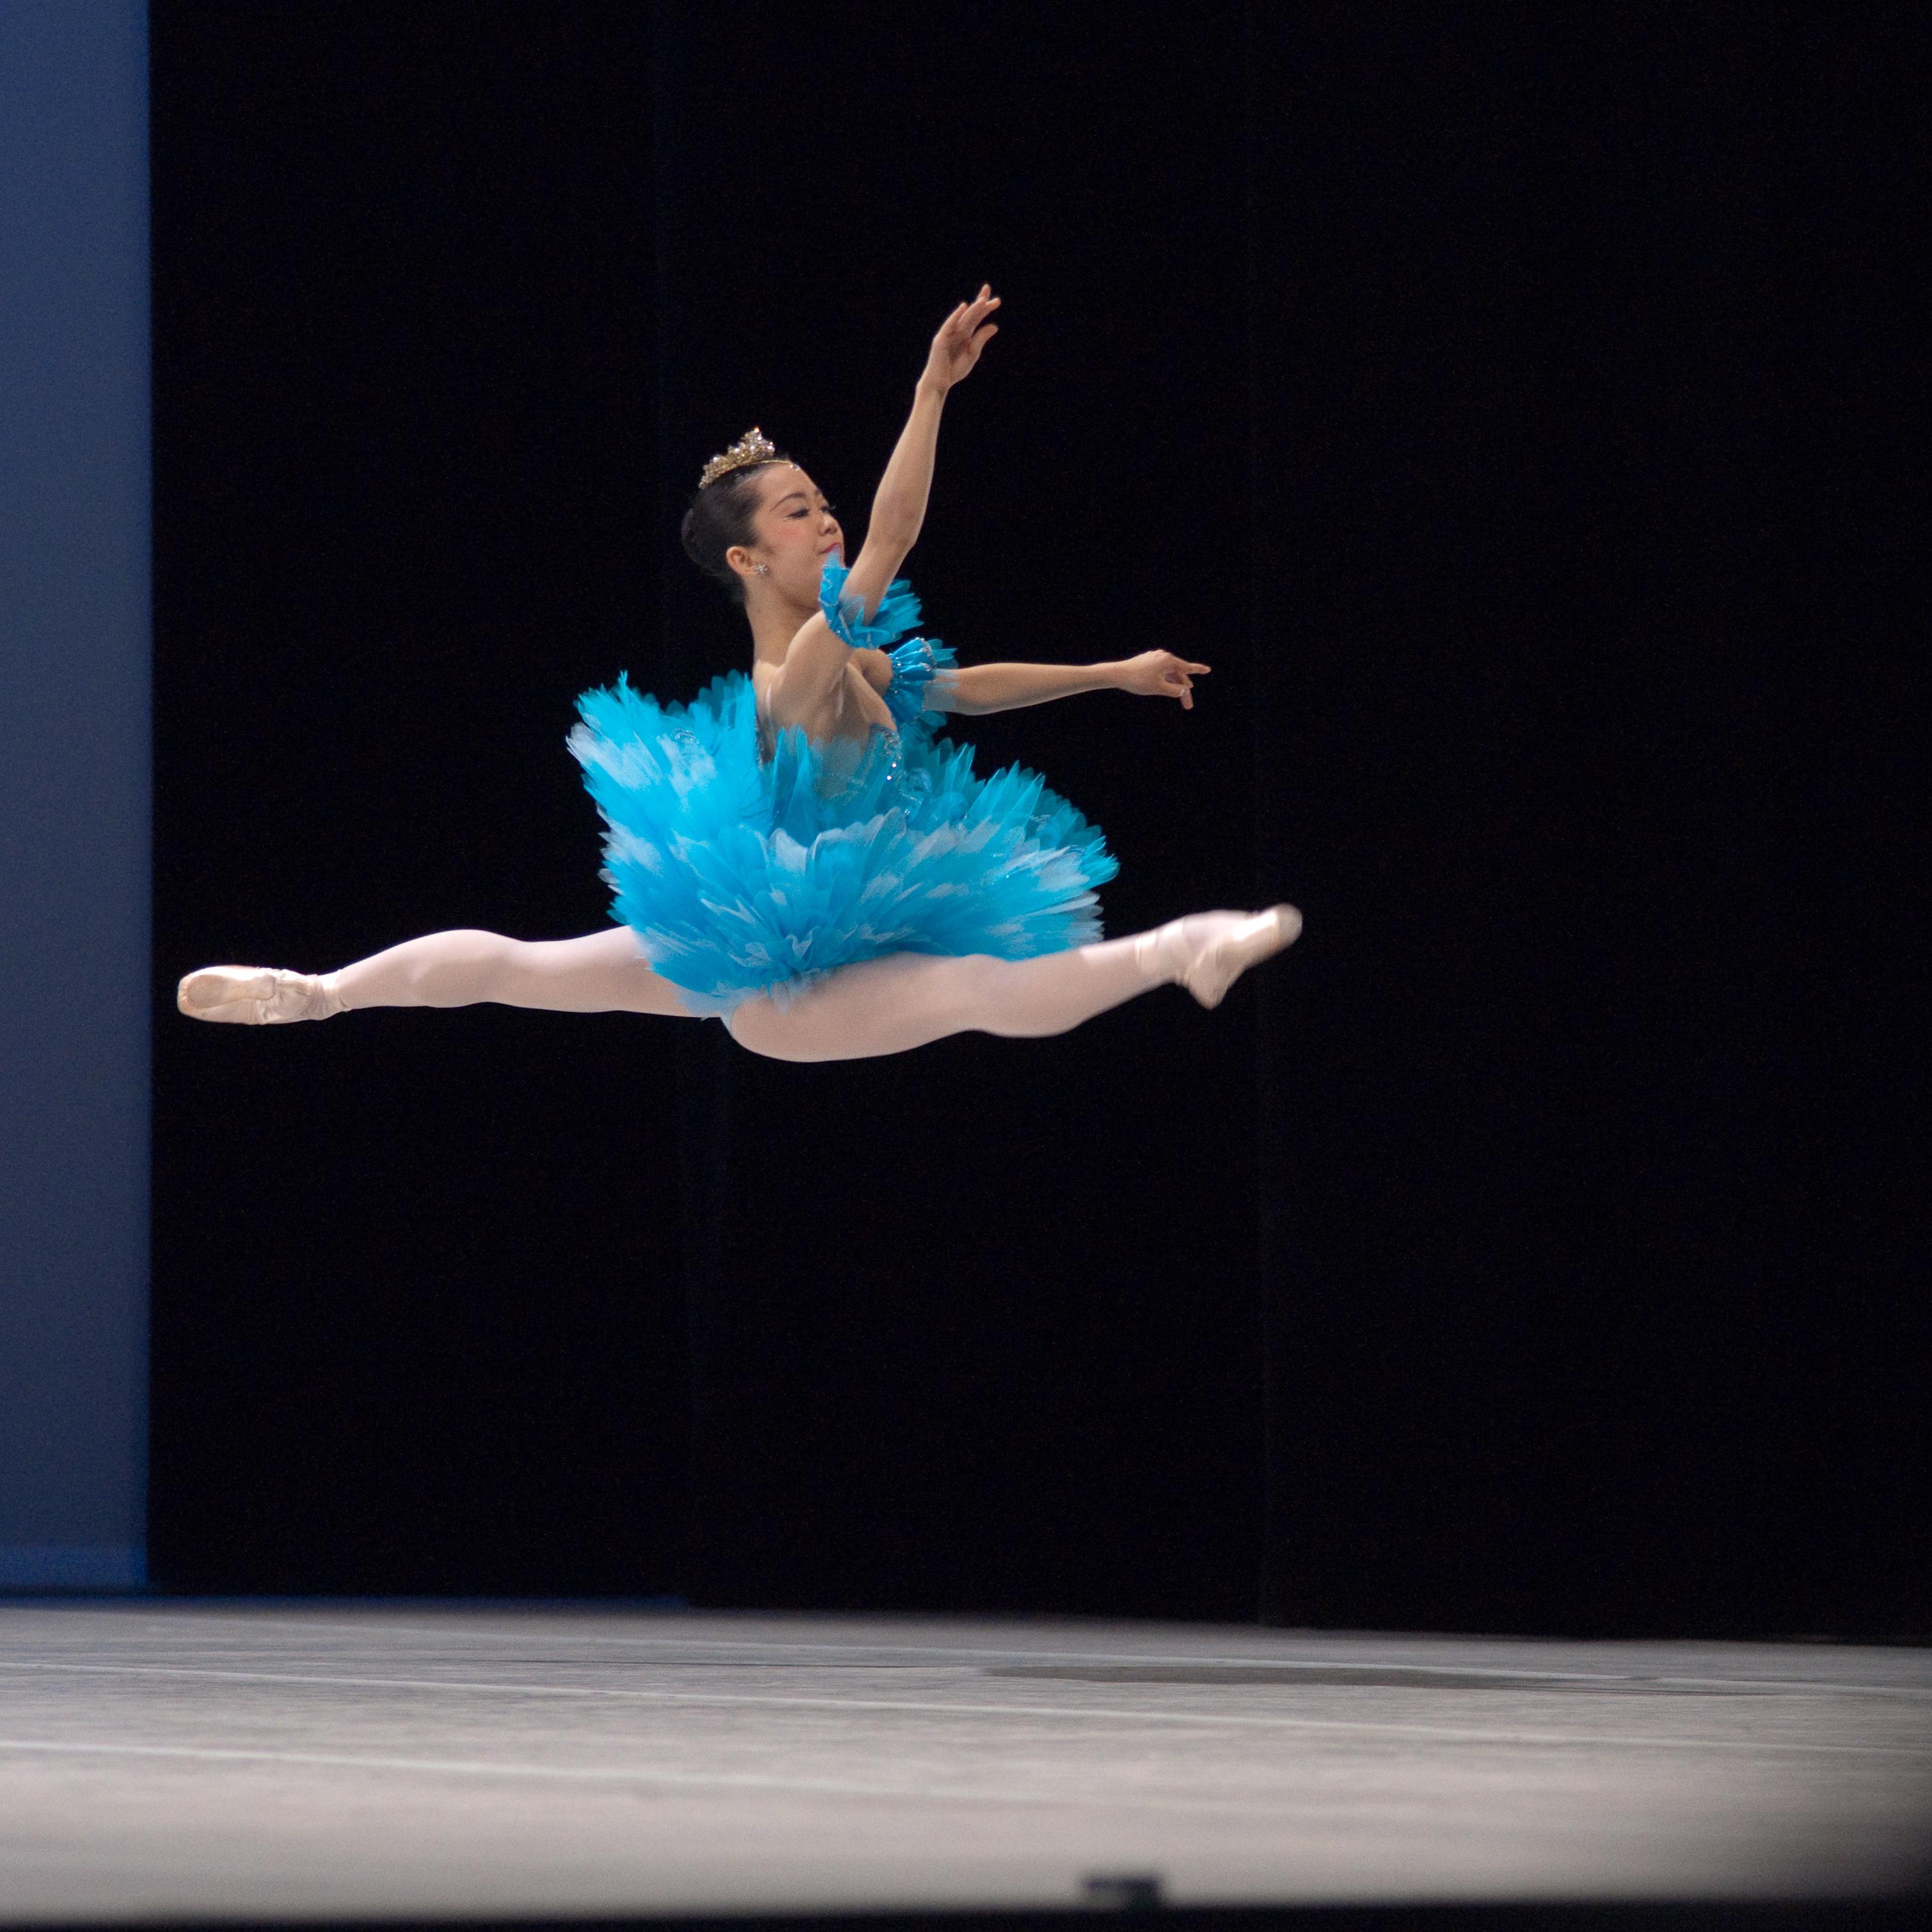 Tutu danse classique for Danse classique adulte